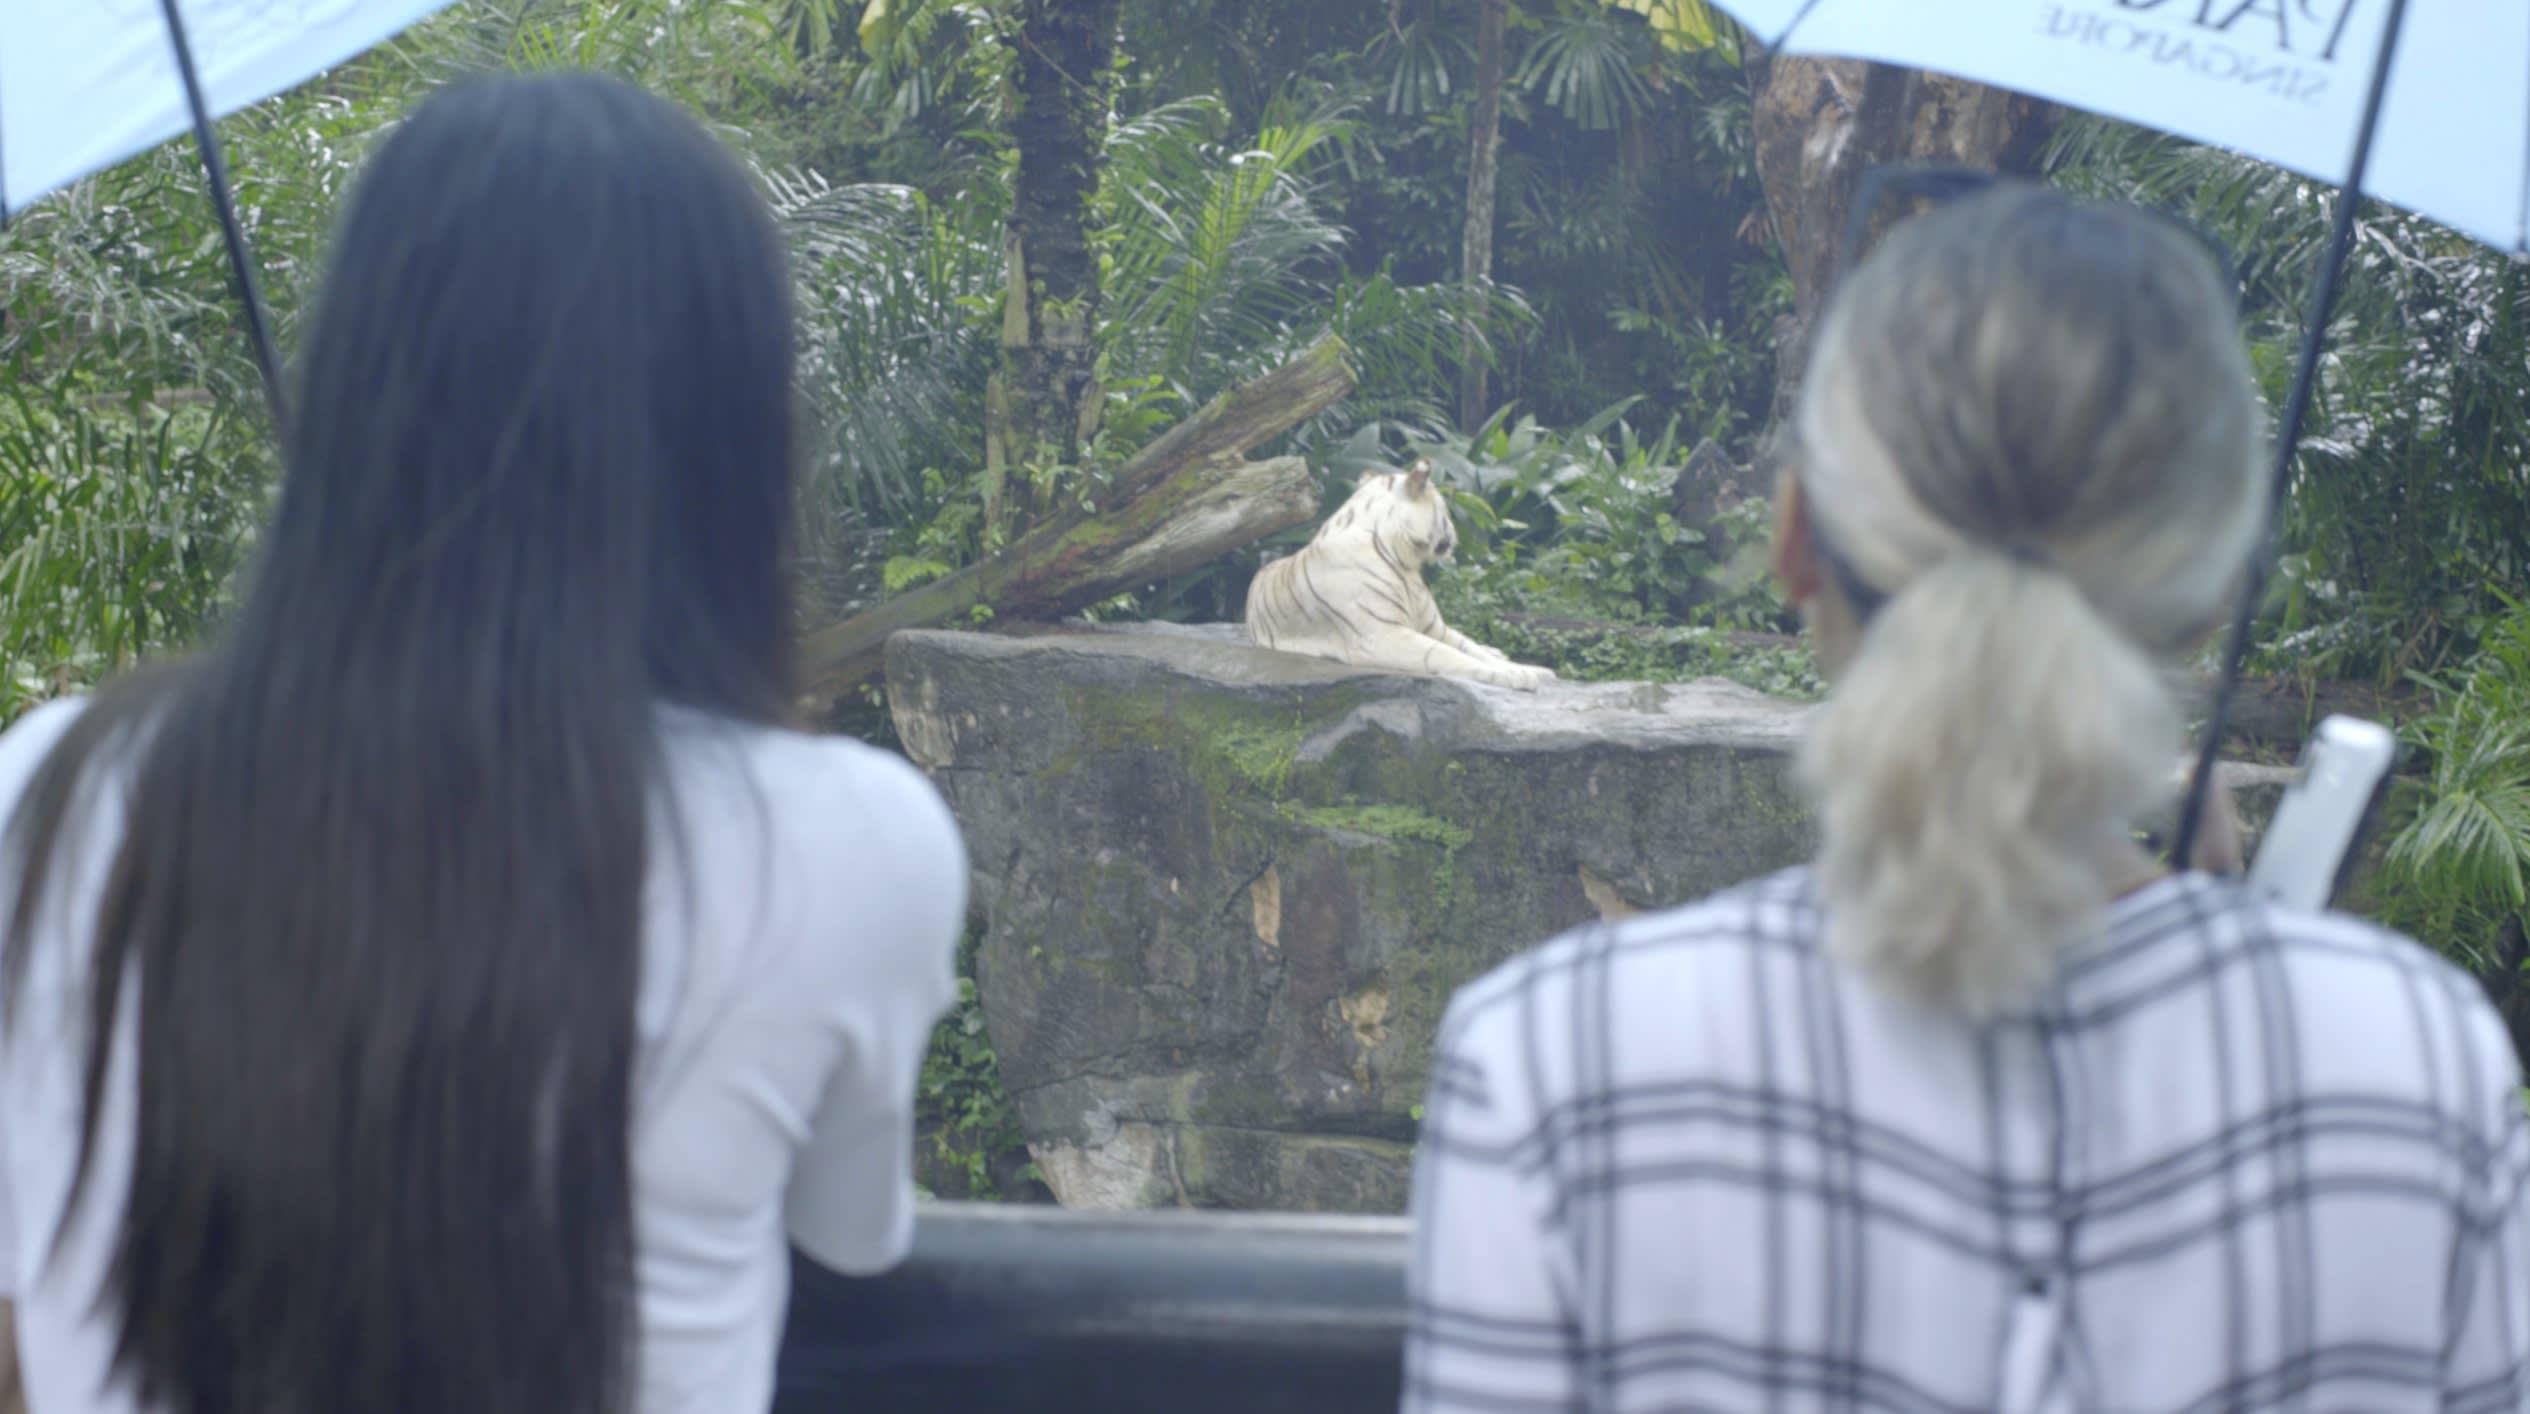 klook singapore gabbi garcia issa pressman singapore zoo